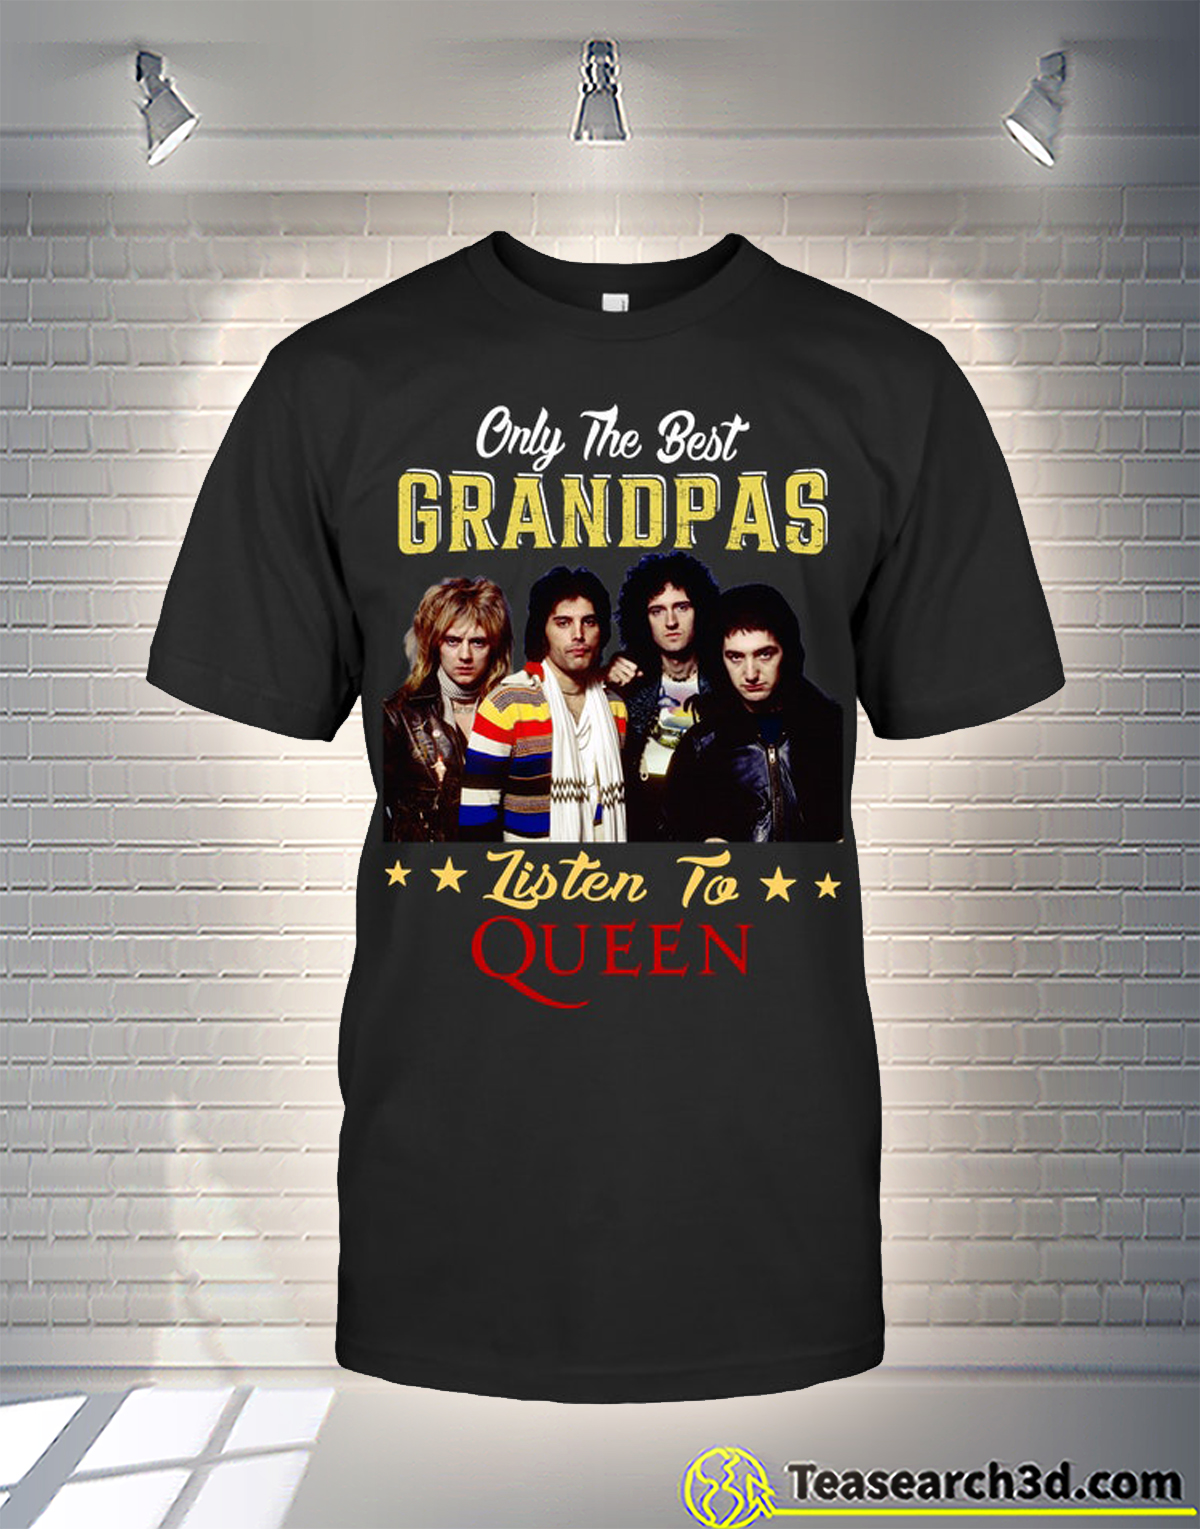 Only the best grandpas listen to the queen shirt